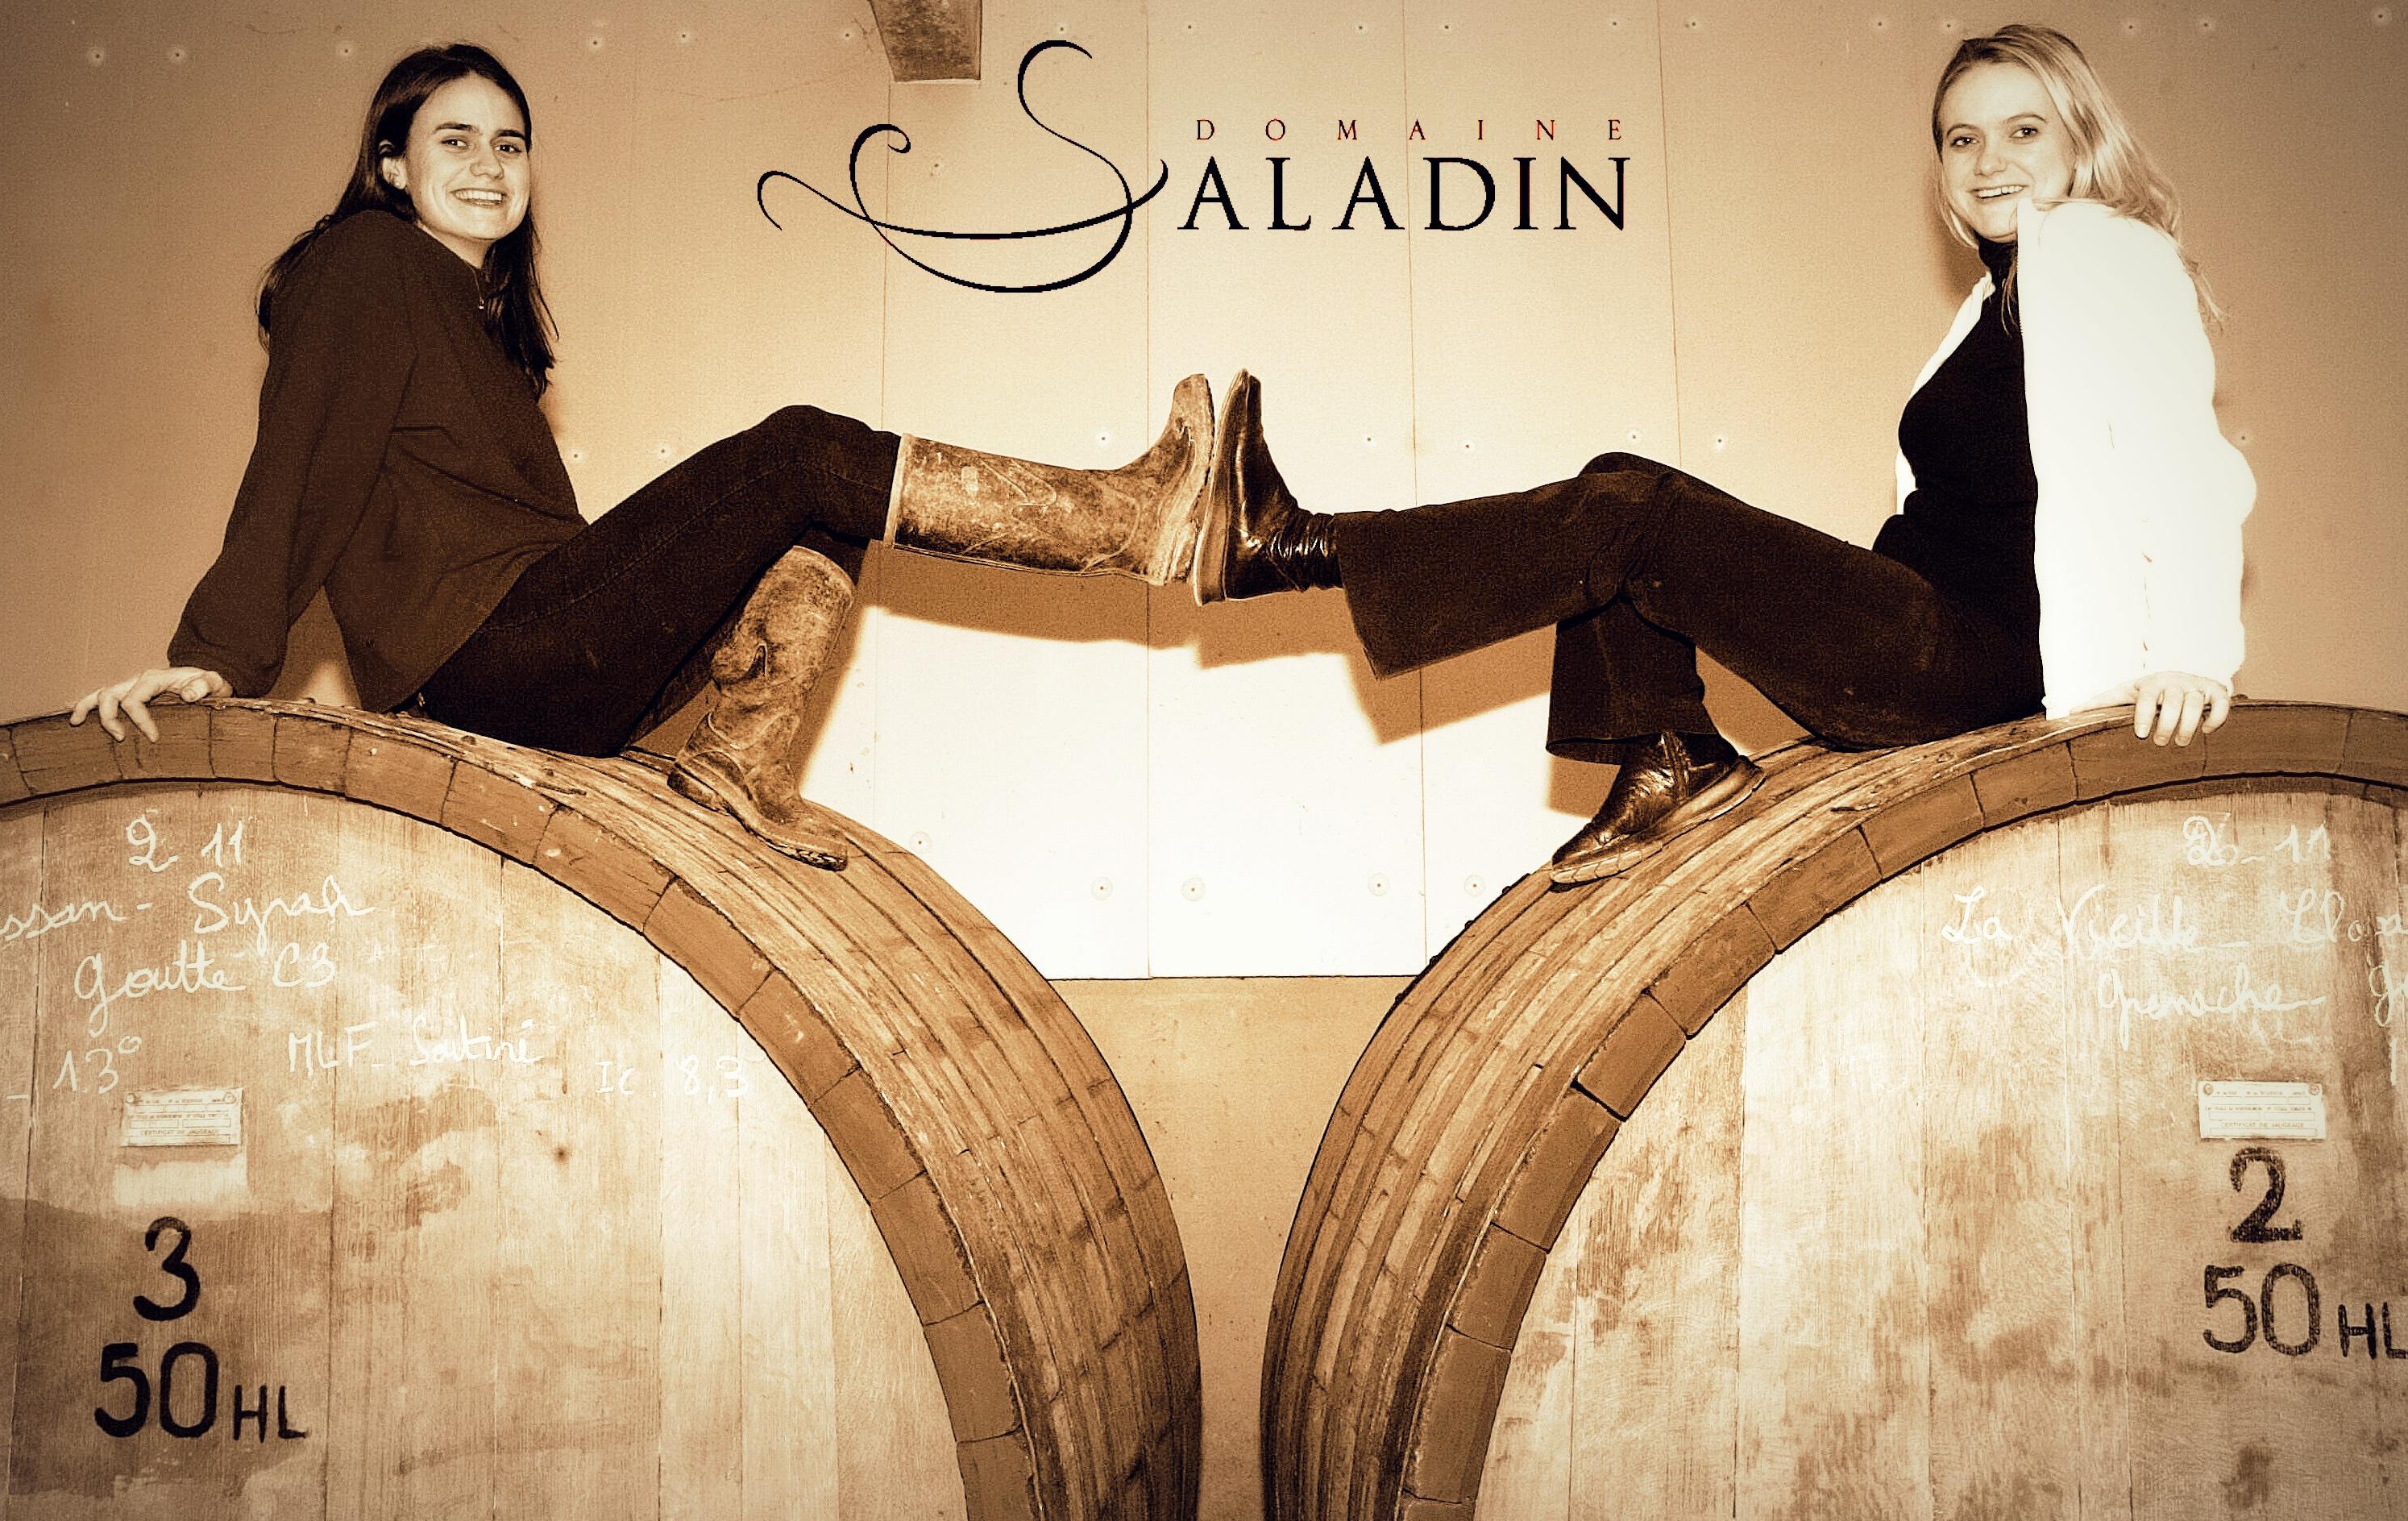 Domaine Saladin